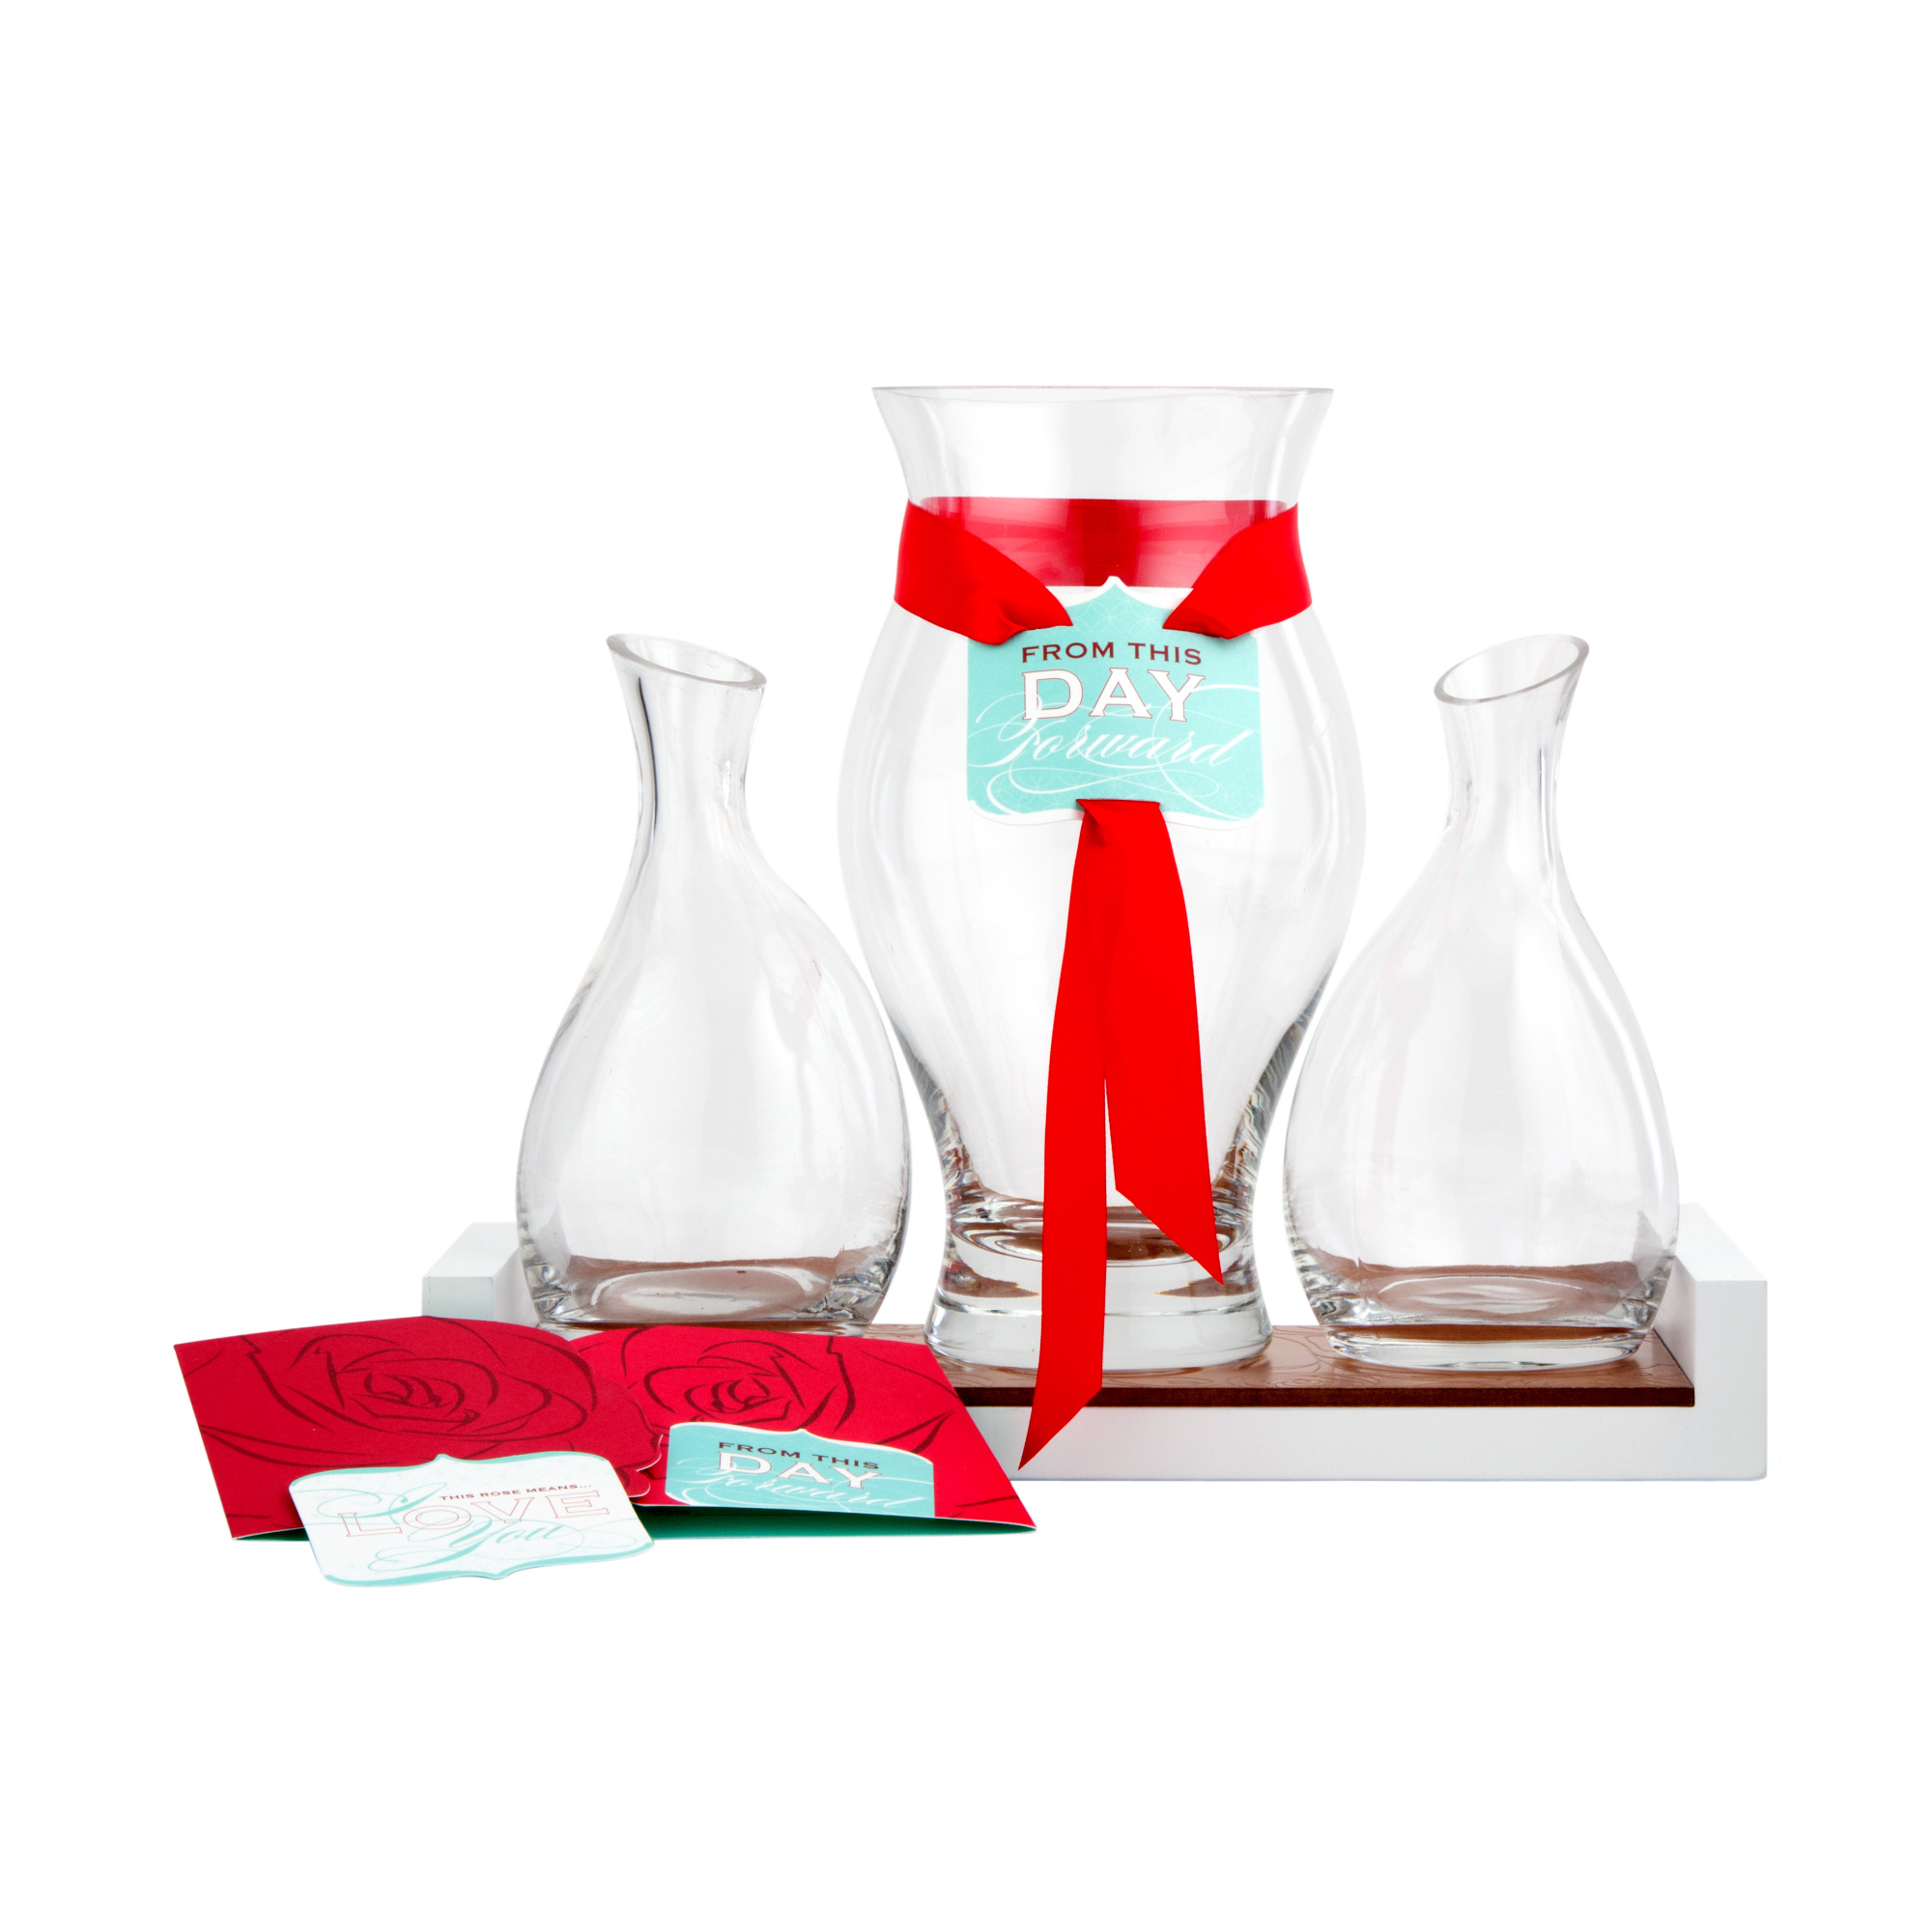 Ceremony Red Rose Vase Glass Set of 3